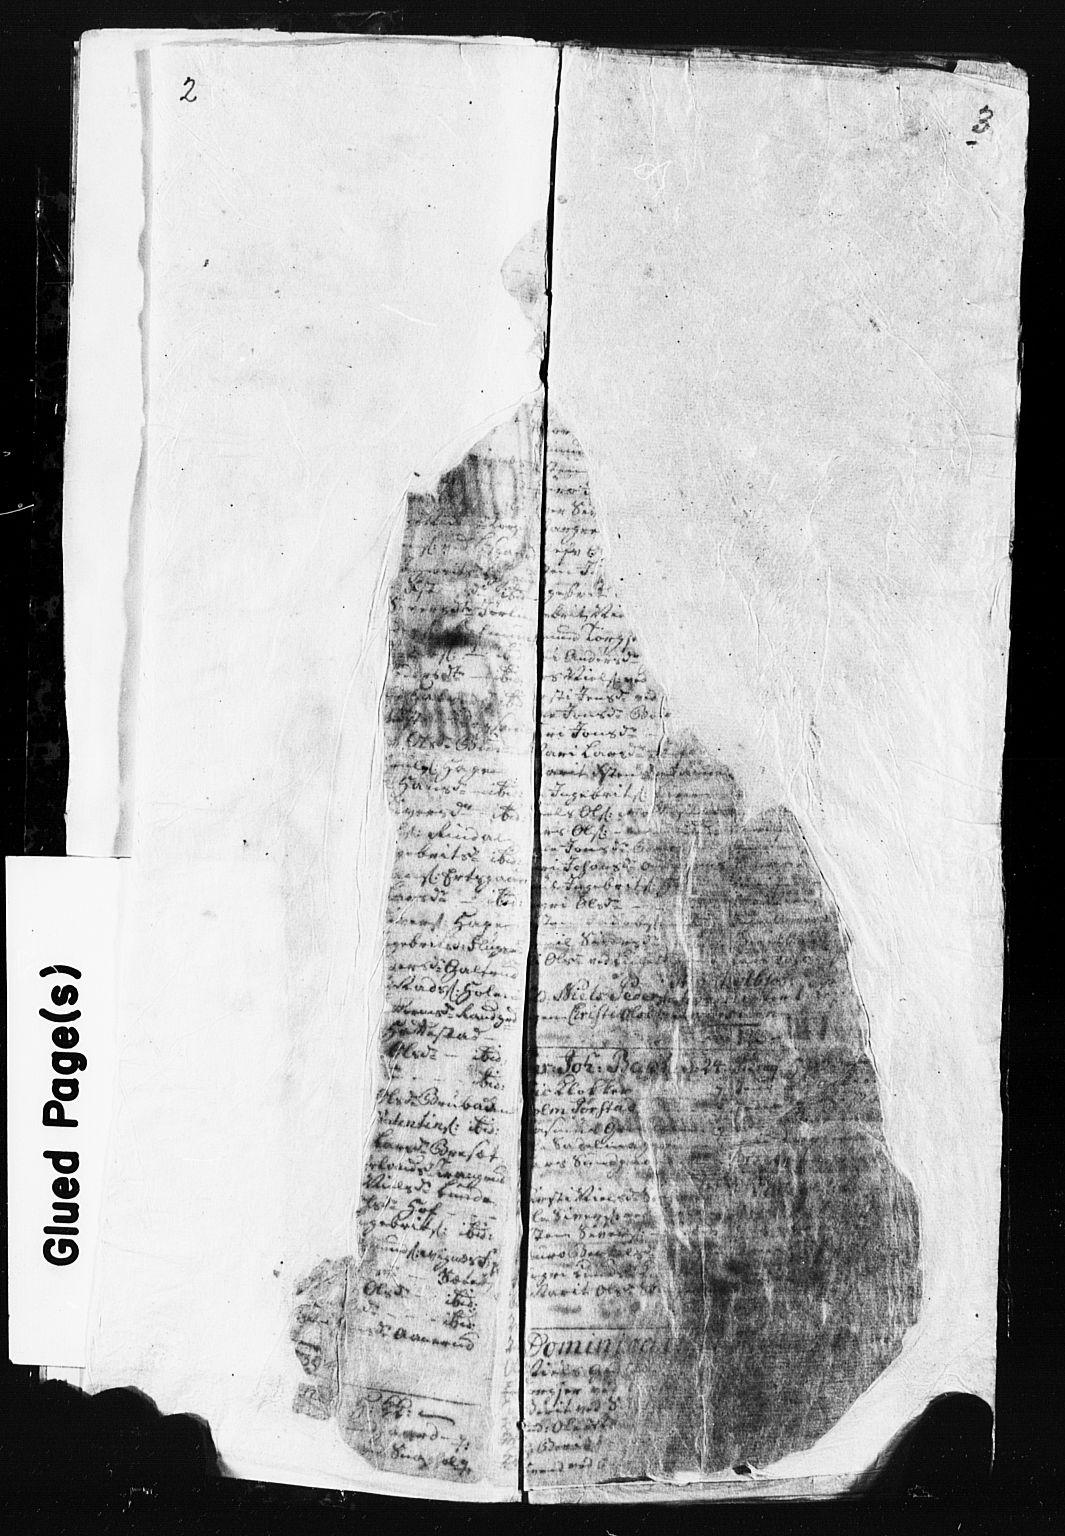 SAH, Fåberg prestekontor, Klokkerbok nr. 3, 1768-1796, s. 2-3